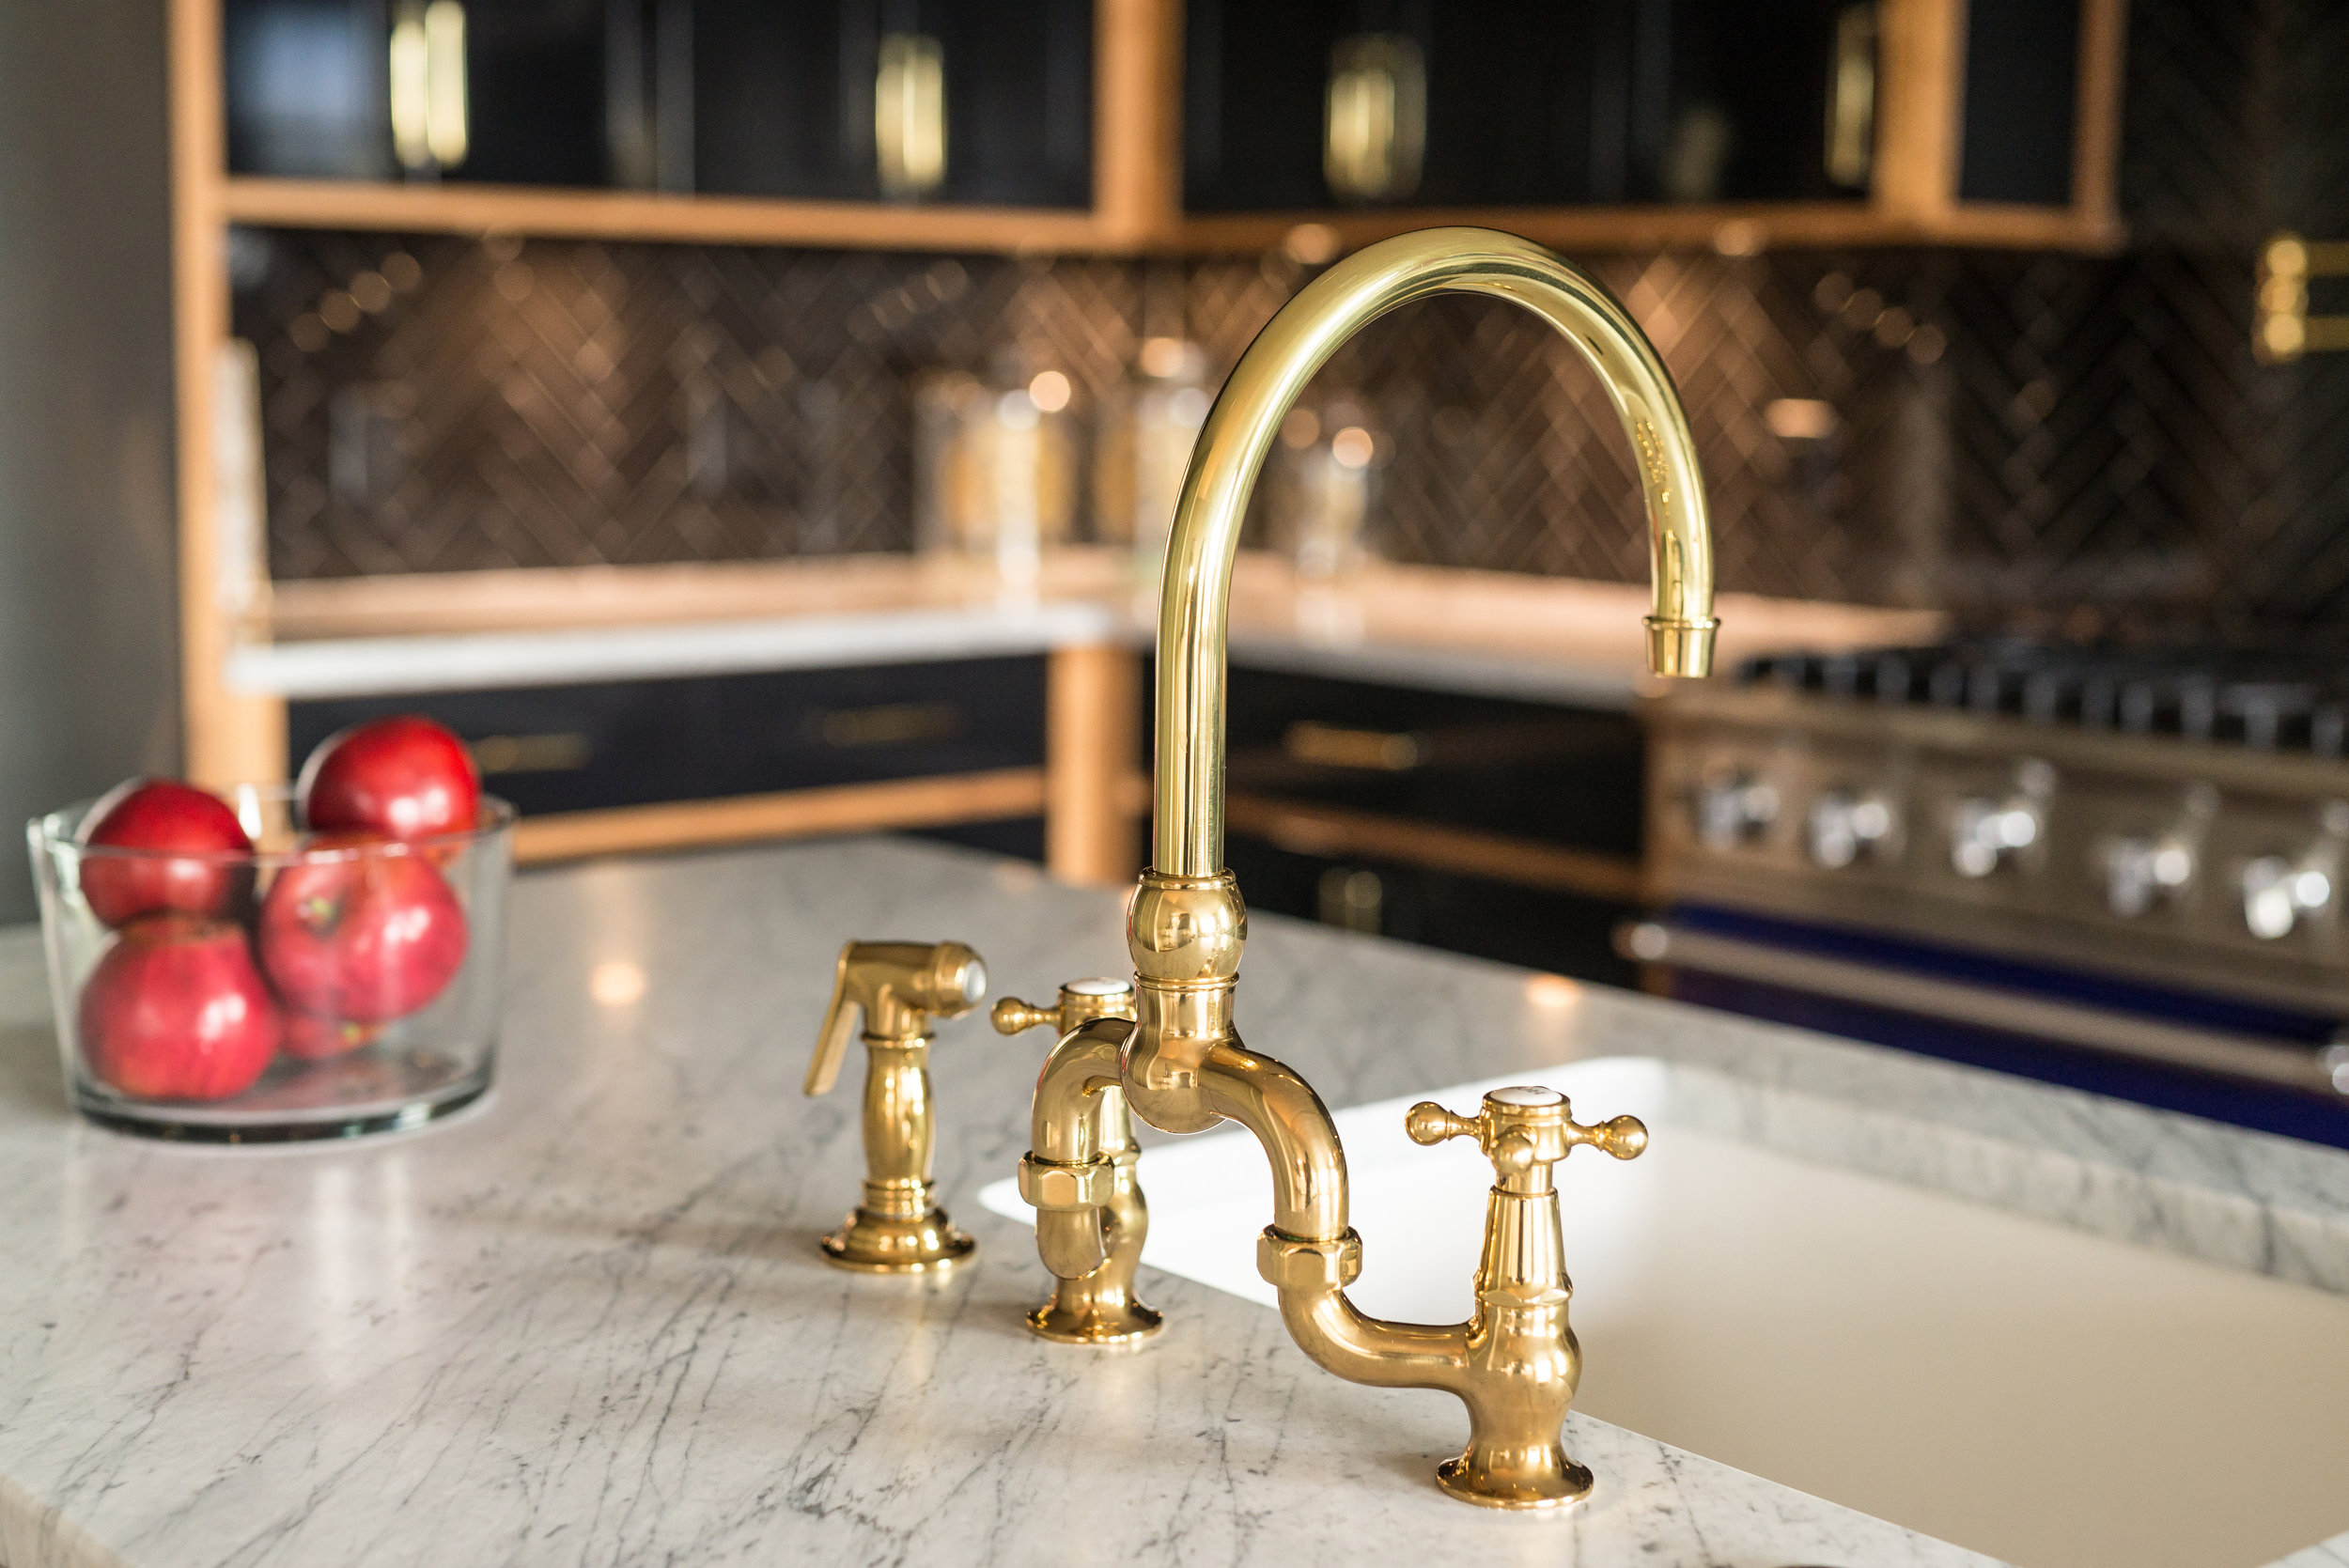 7 kitchen Faucet.jpg